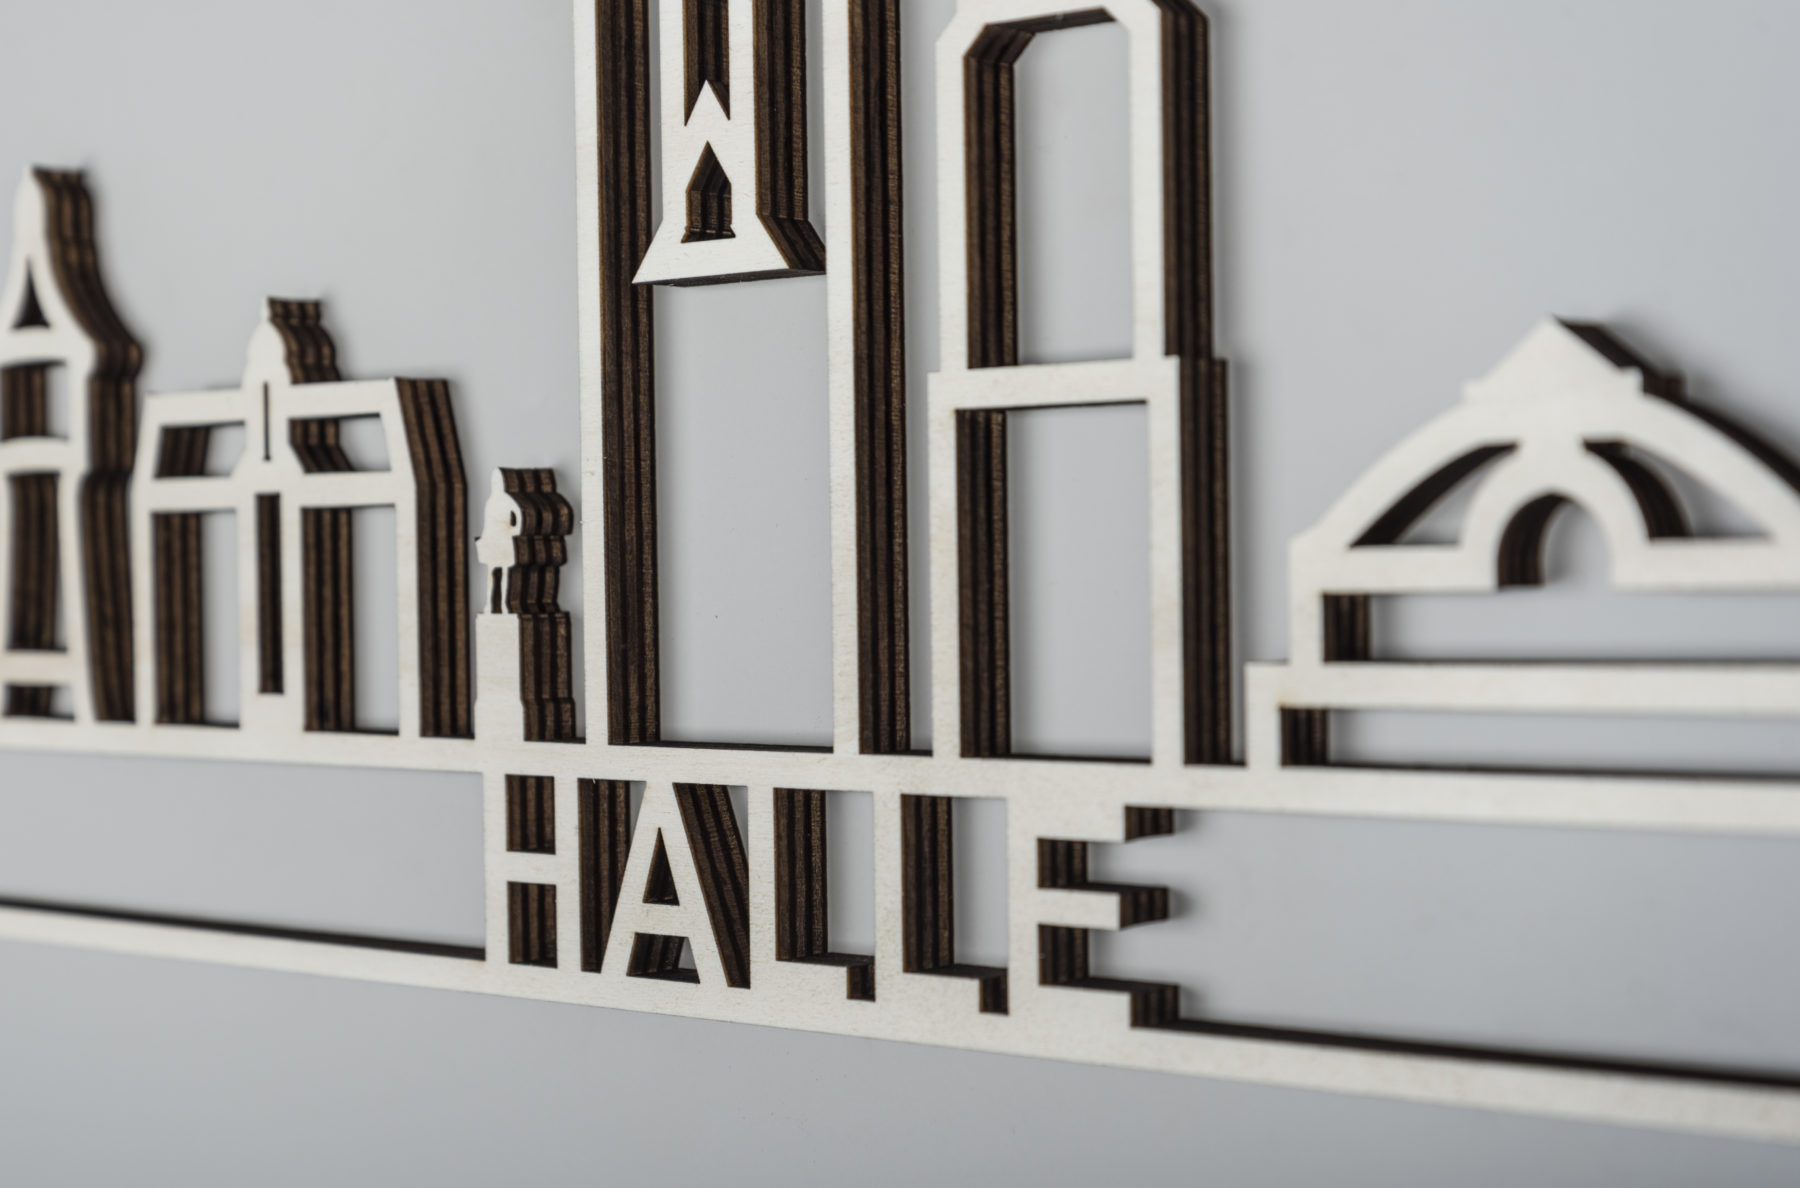 Skyline Halle